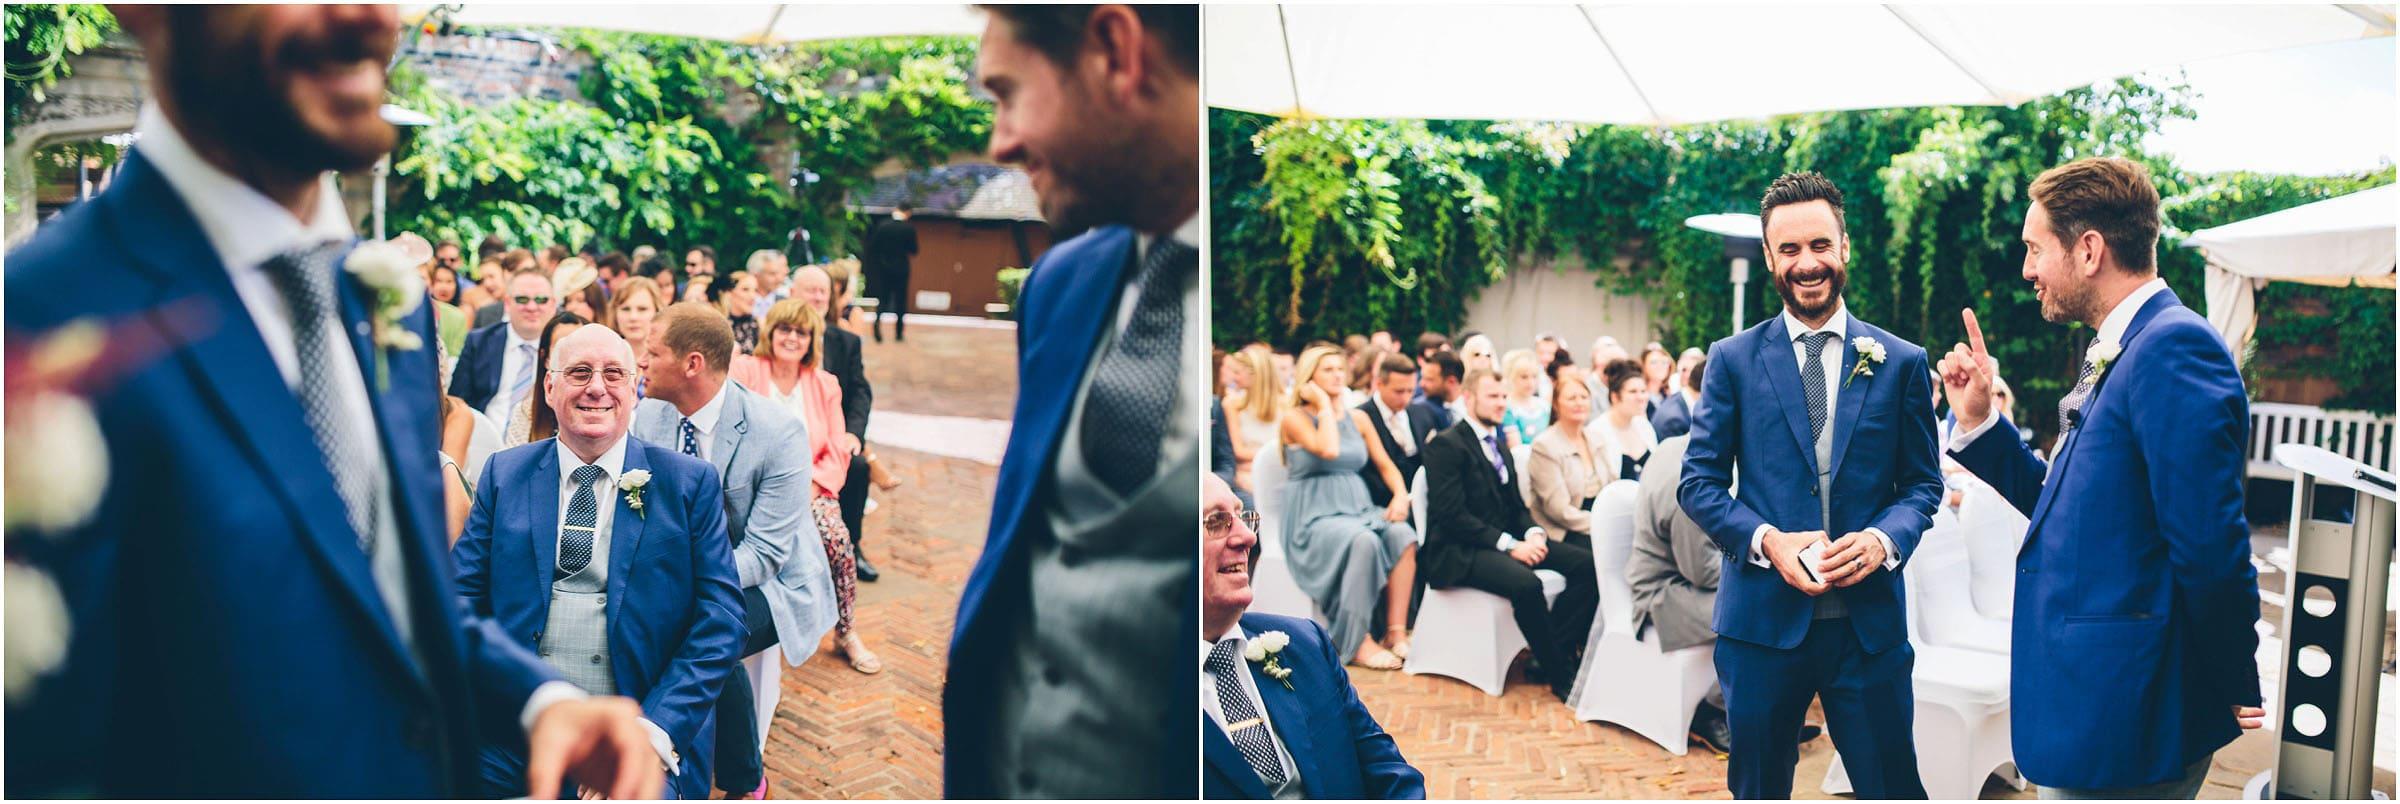 Kensington_Roof_Gardens_Wedding_Photography_0025